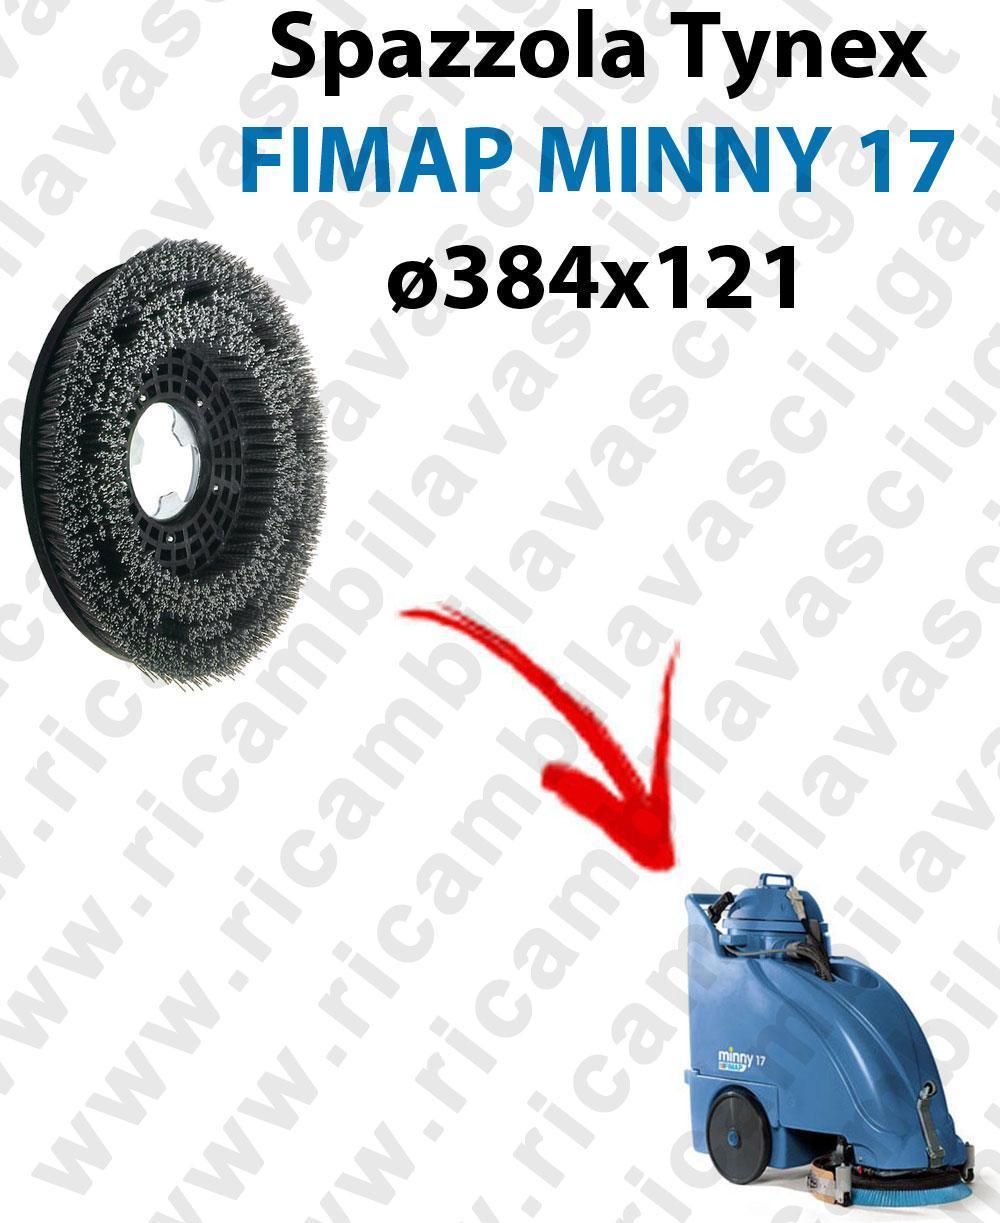 Cepillo TYNEX  para fregadora FIMAP MINNY 17. modelo: tynex  ø 384 X 121